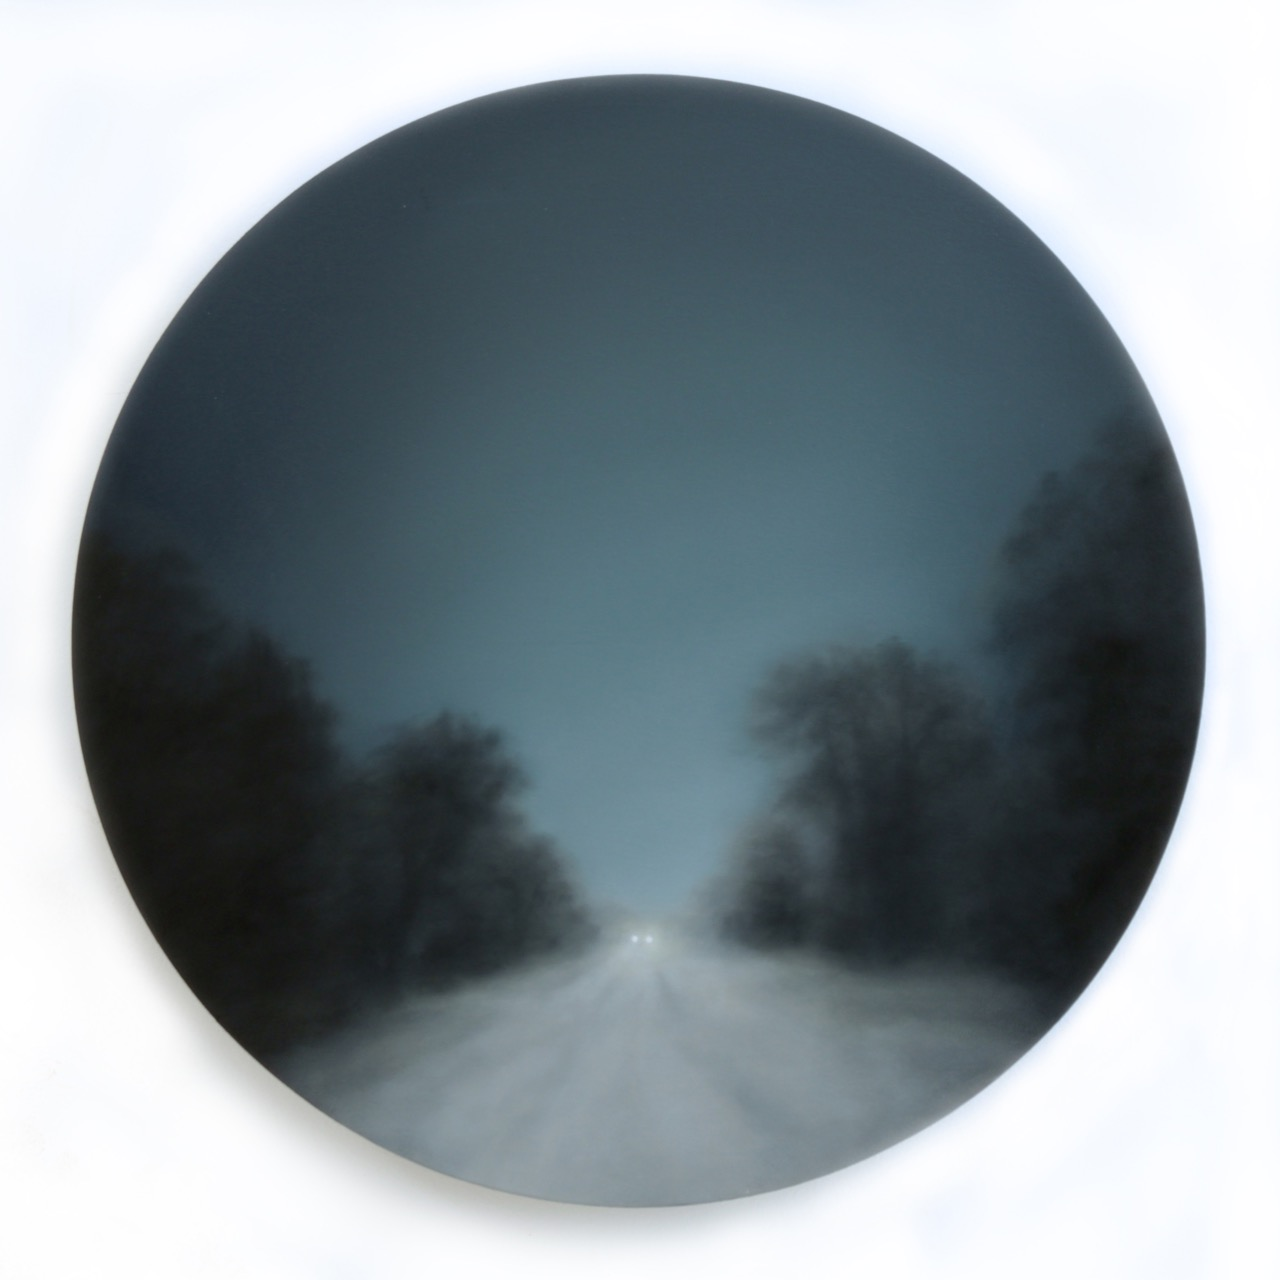 Gill Rocca  Figment XXVII 2019 Oil on birch ply 30 cm diameter